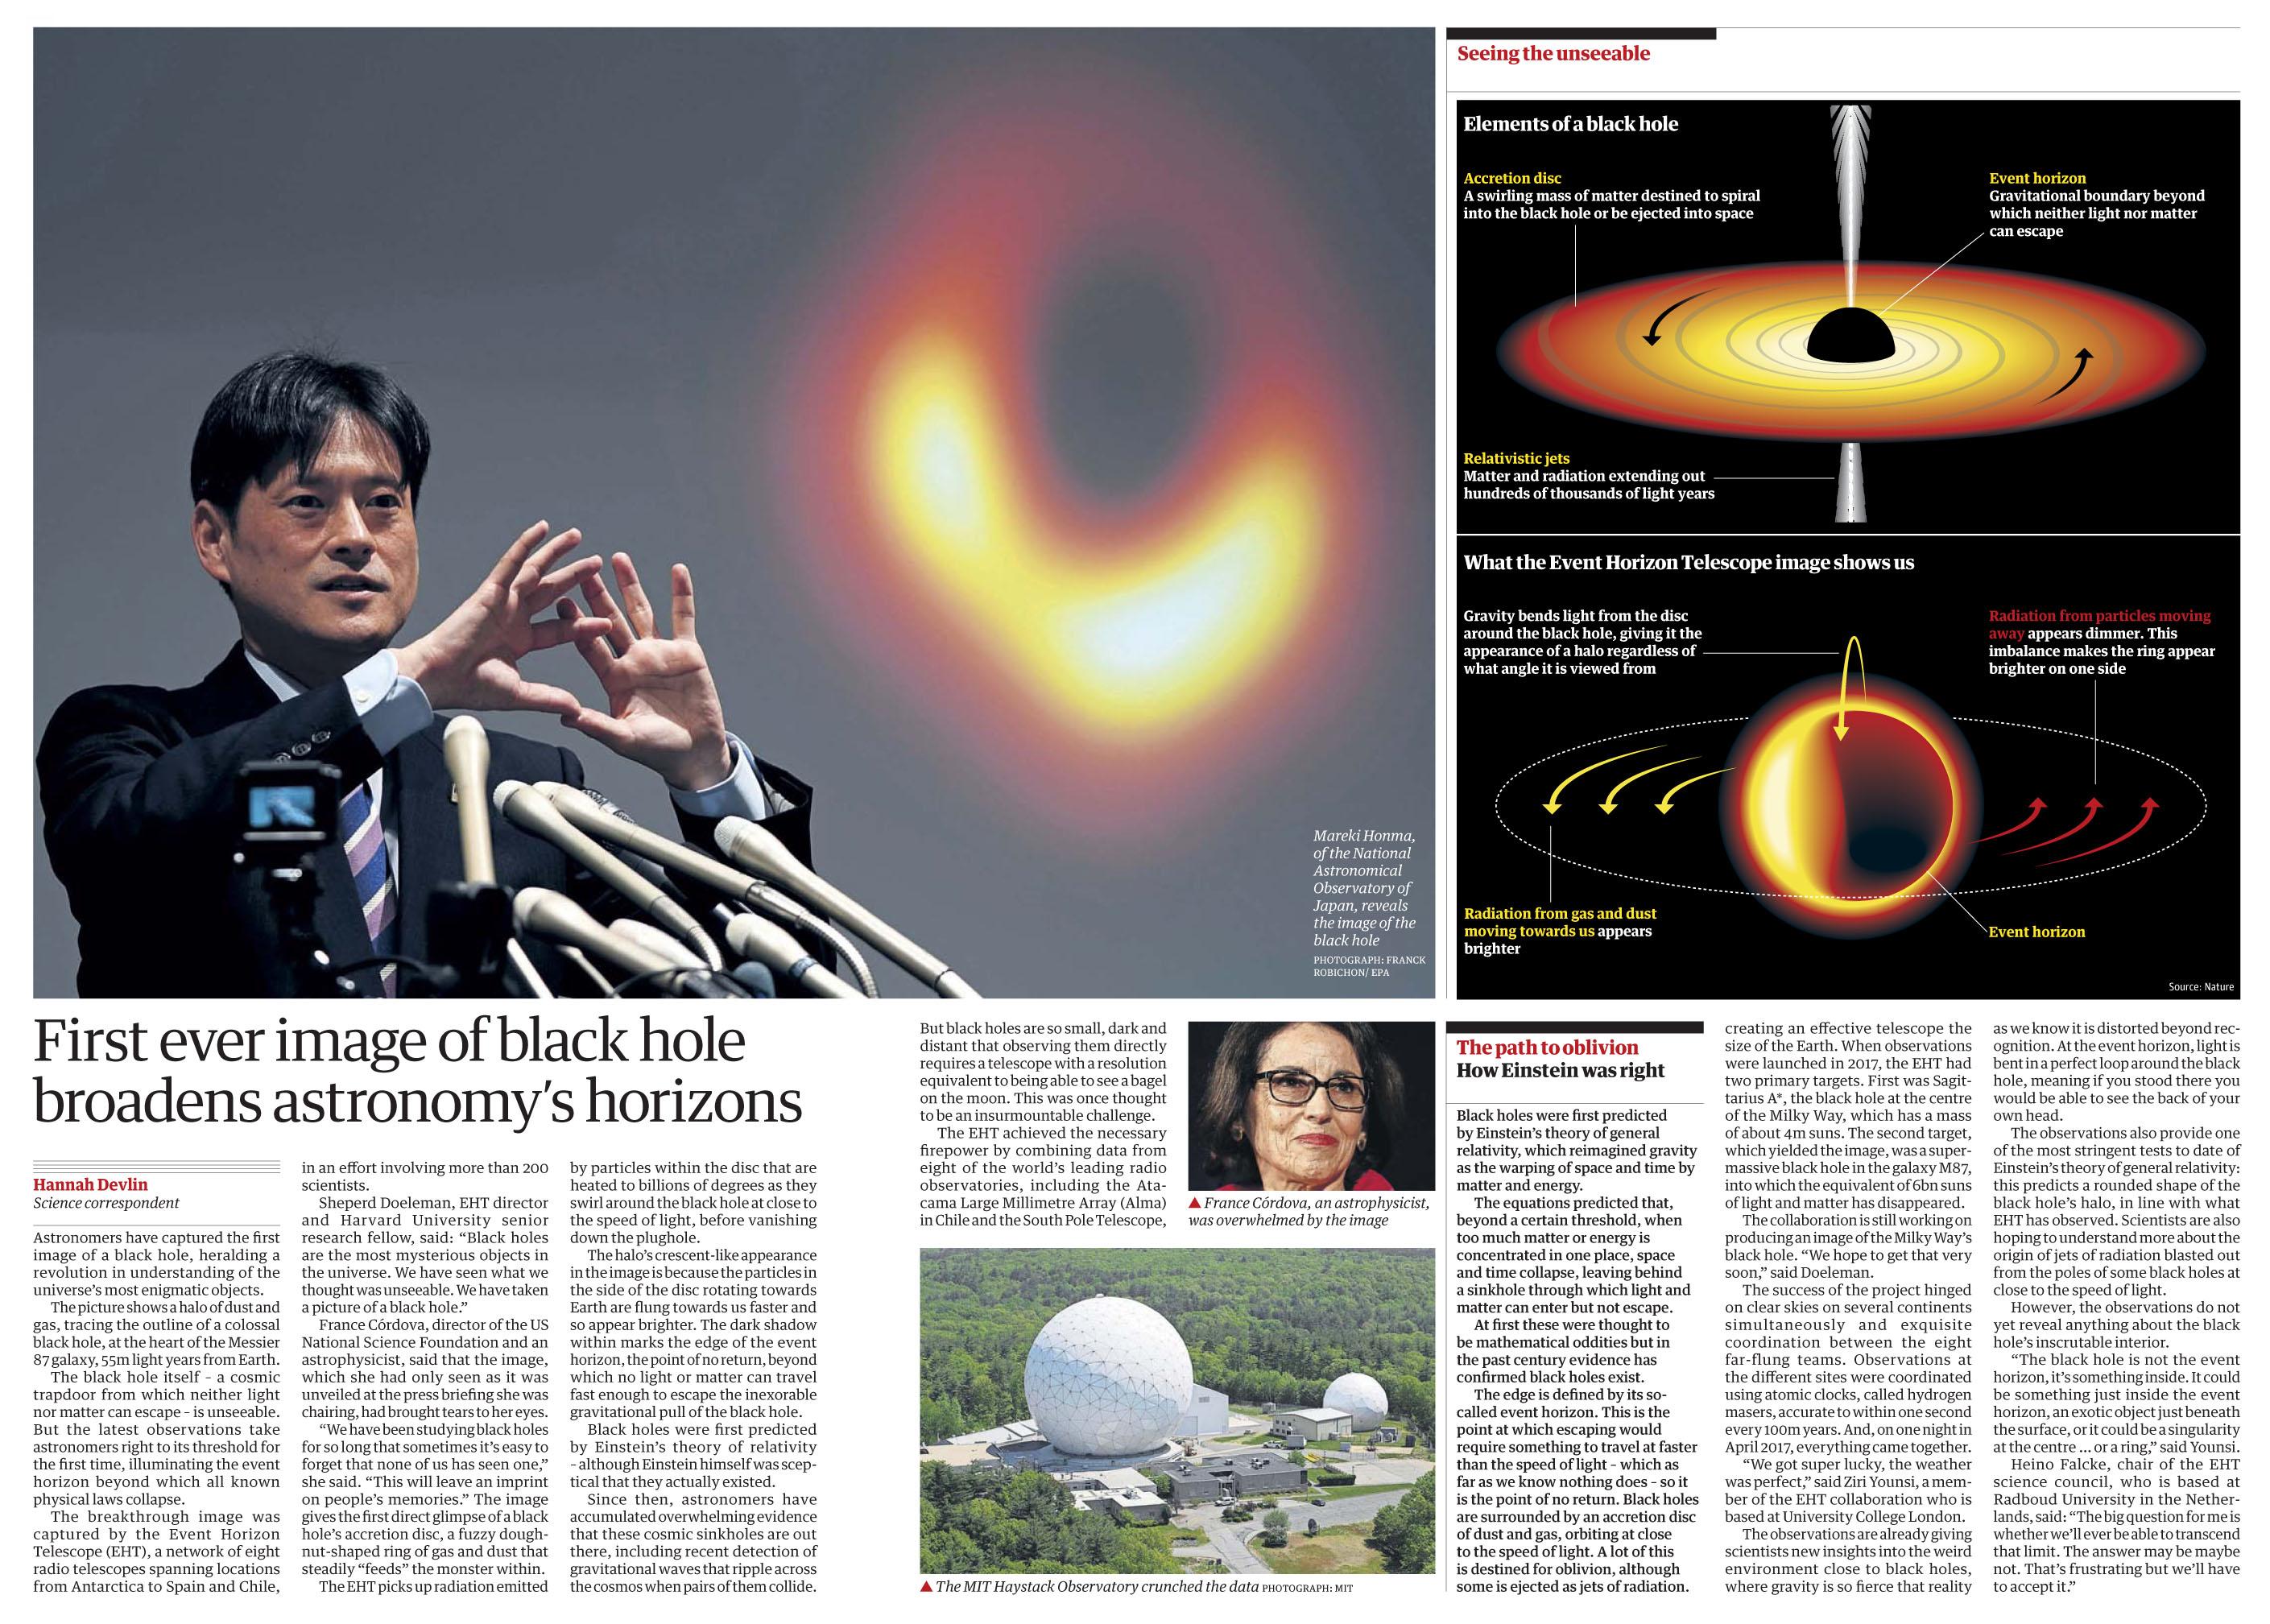 The Guardian April 11 2019 Black Hole.jpg